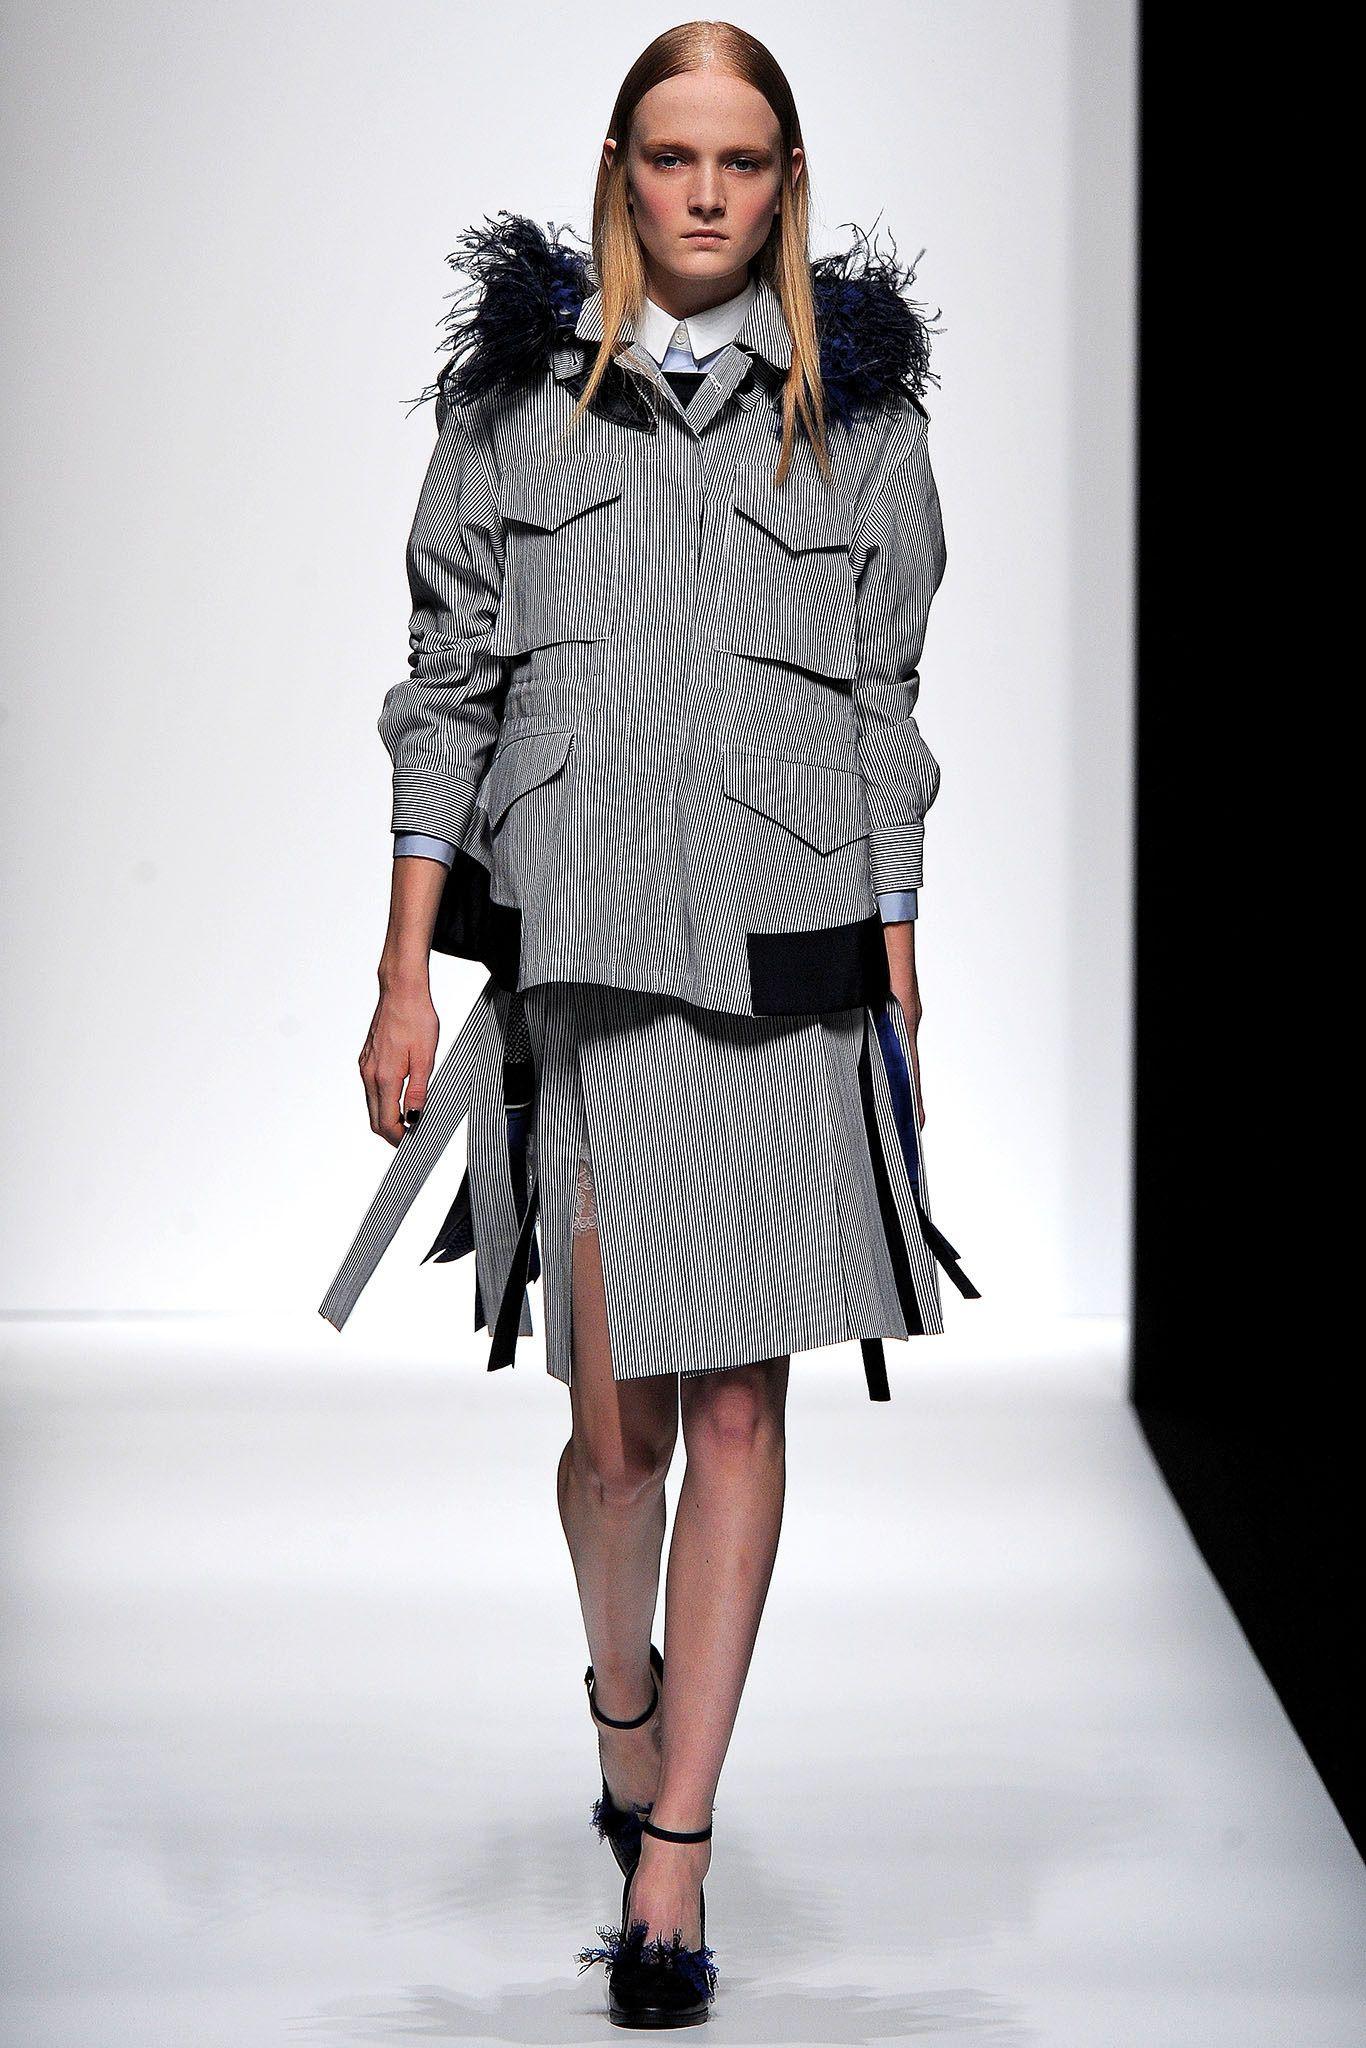 Sacai Spring 2013 Ready-to-Wear Fashion Show - Maja Salamon (Next)